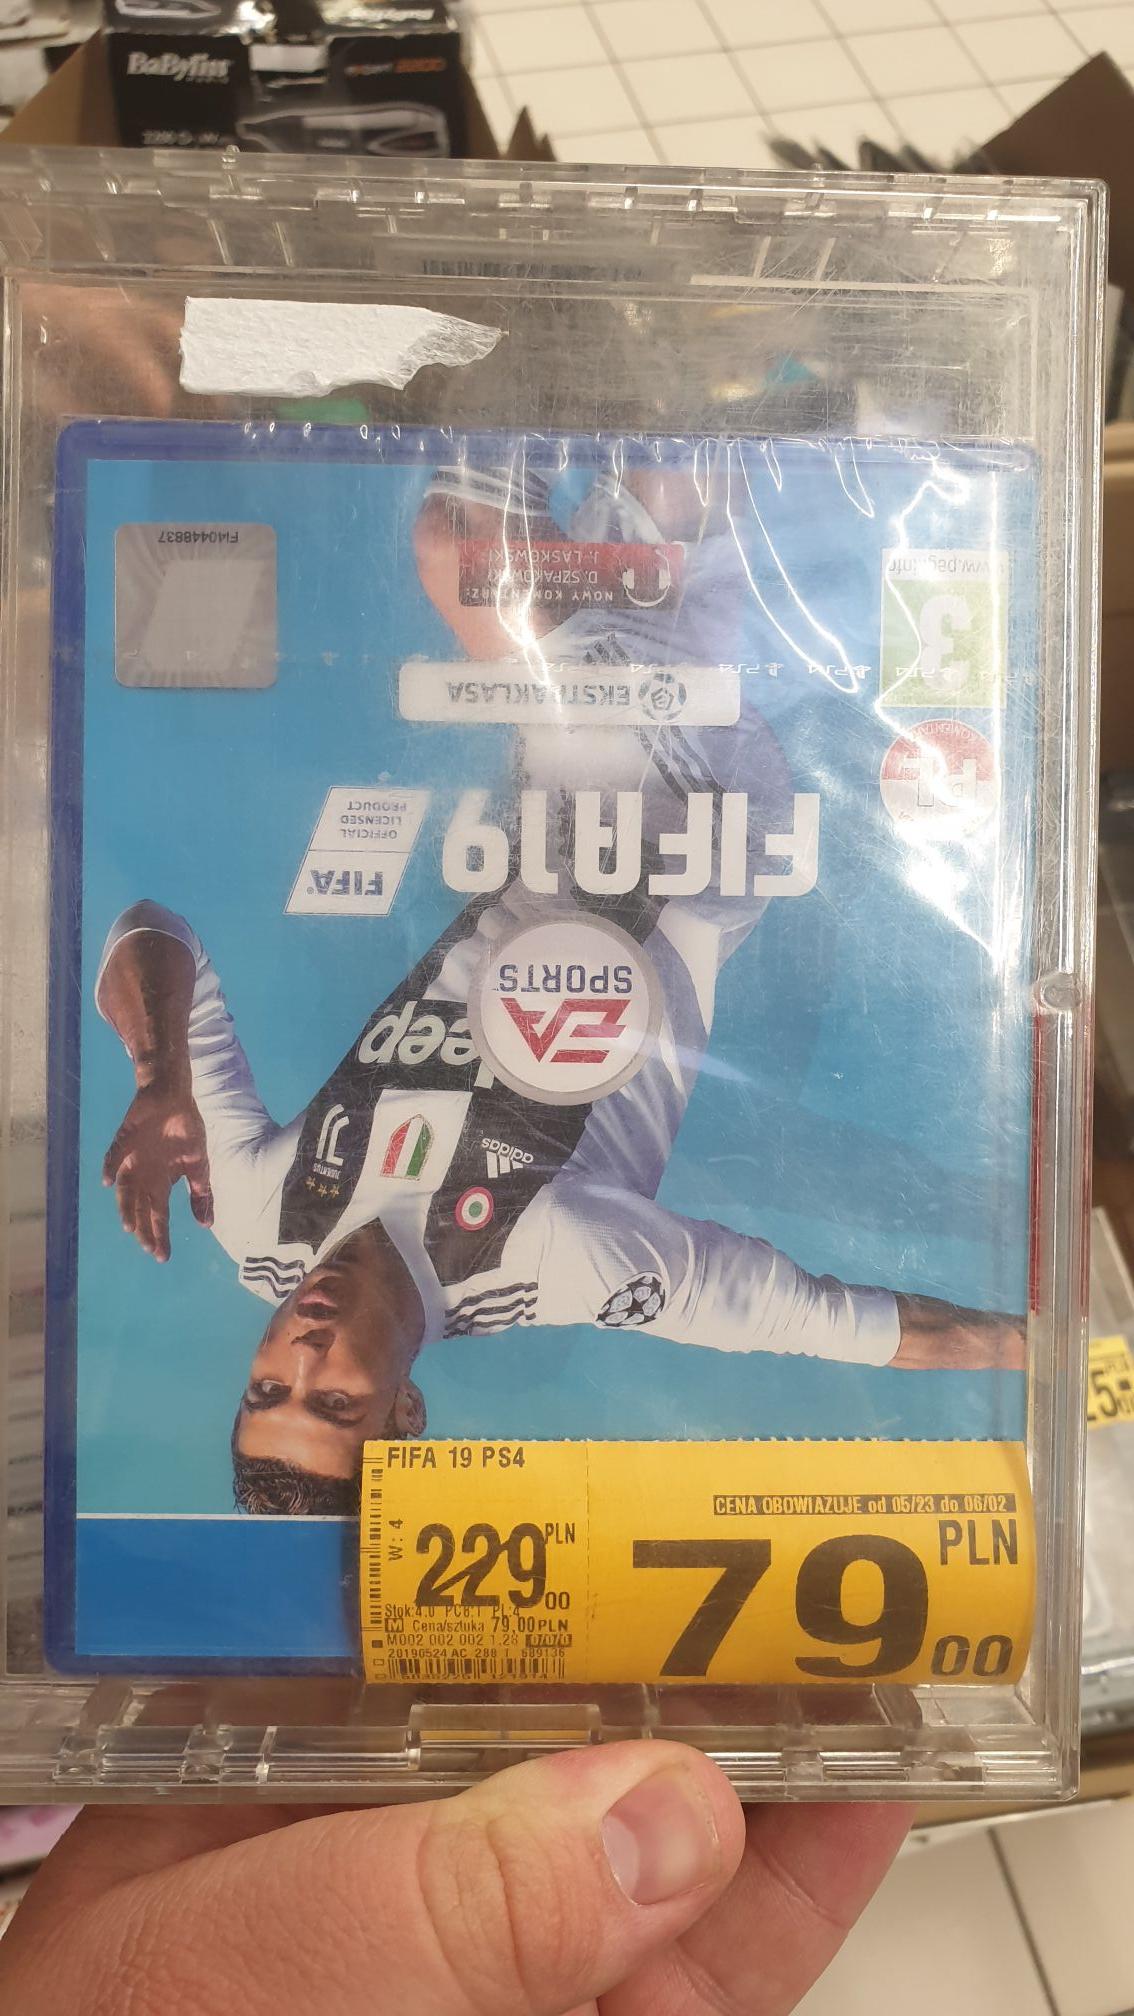 Fifa 19 / Hitman 2 / Battlefield V  - PS4 @ Auchan Katowice